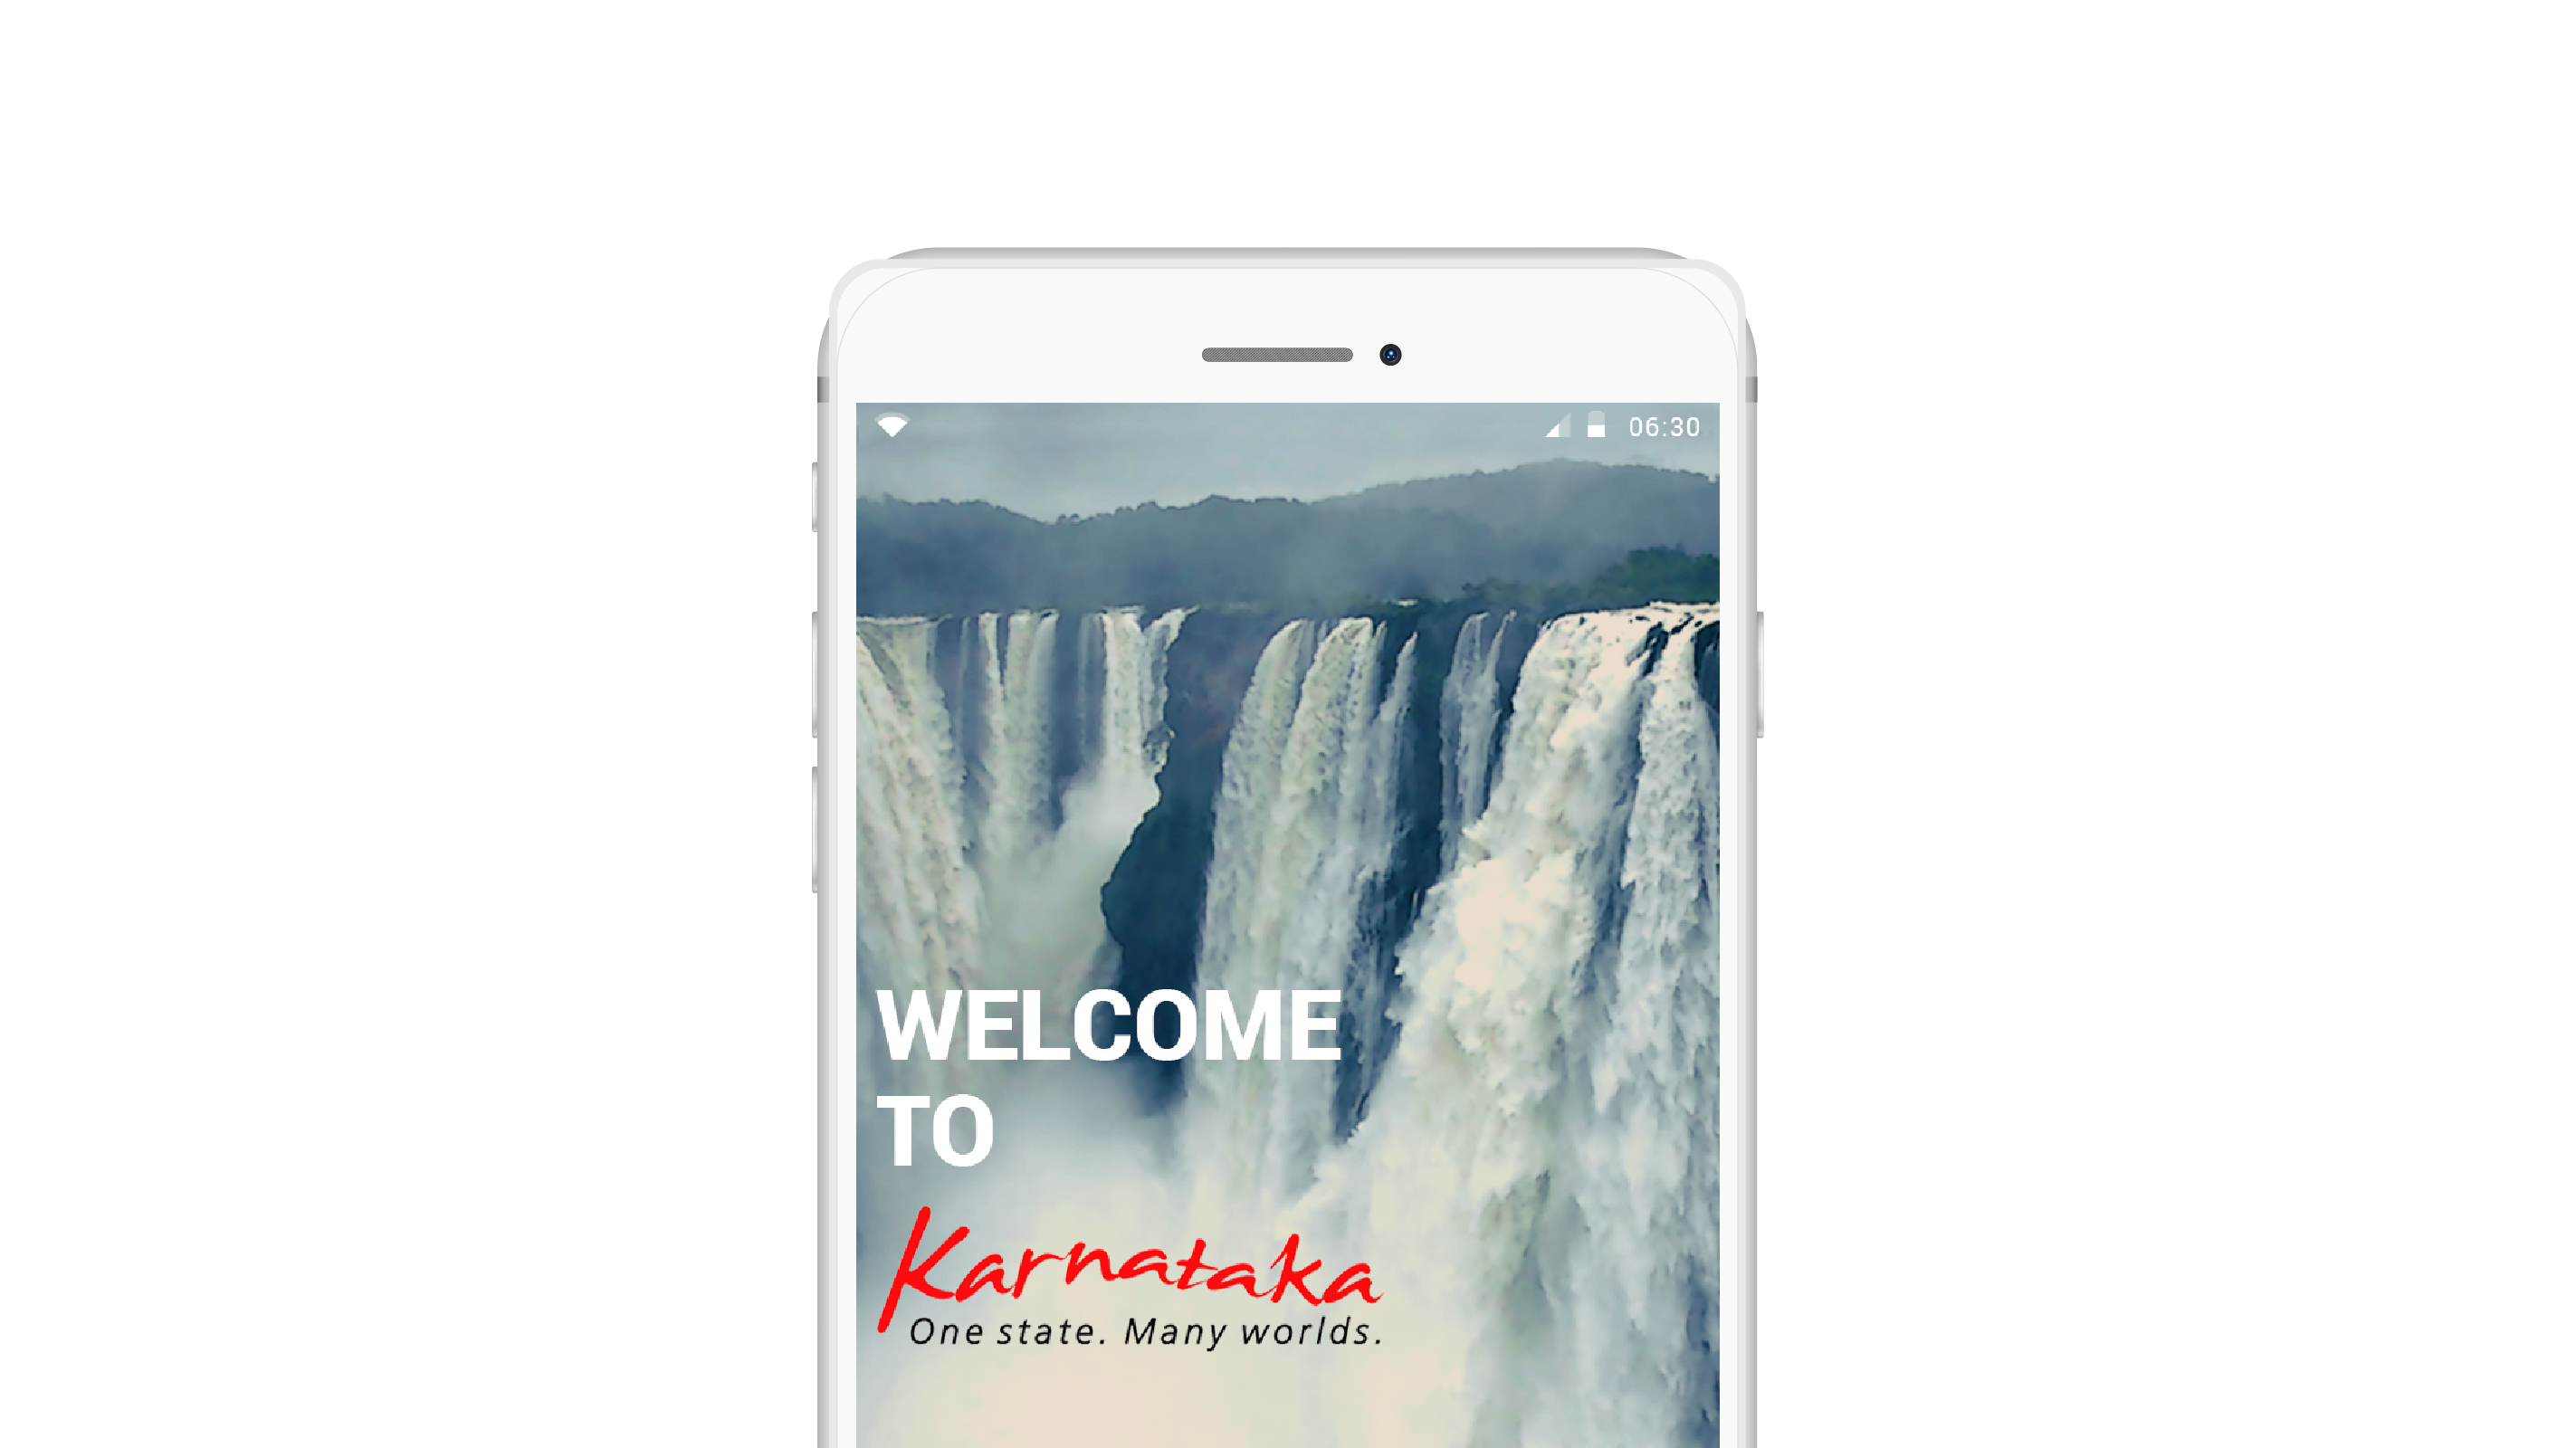 Karnataka Tourism App